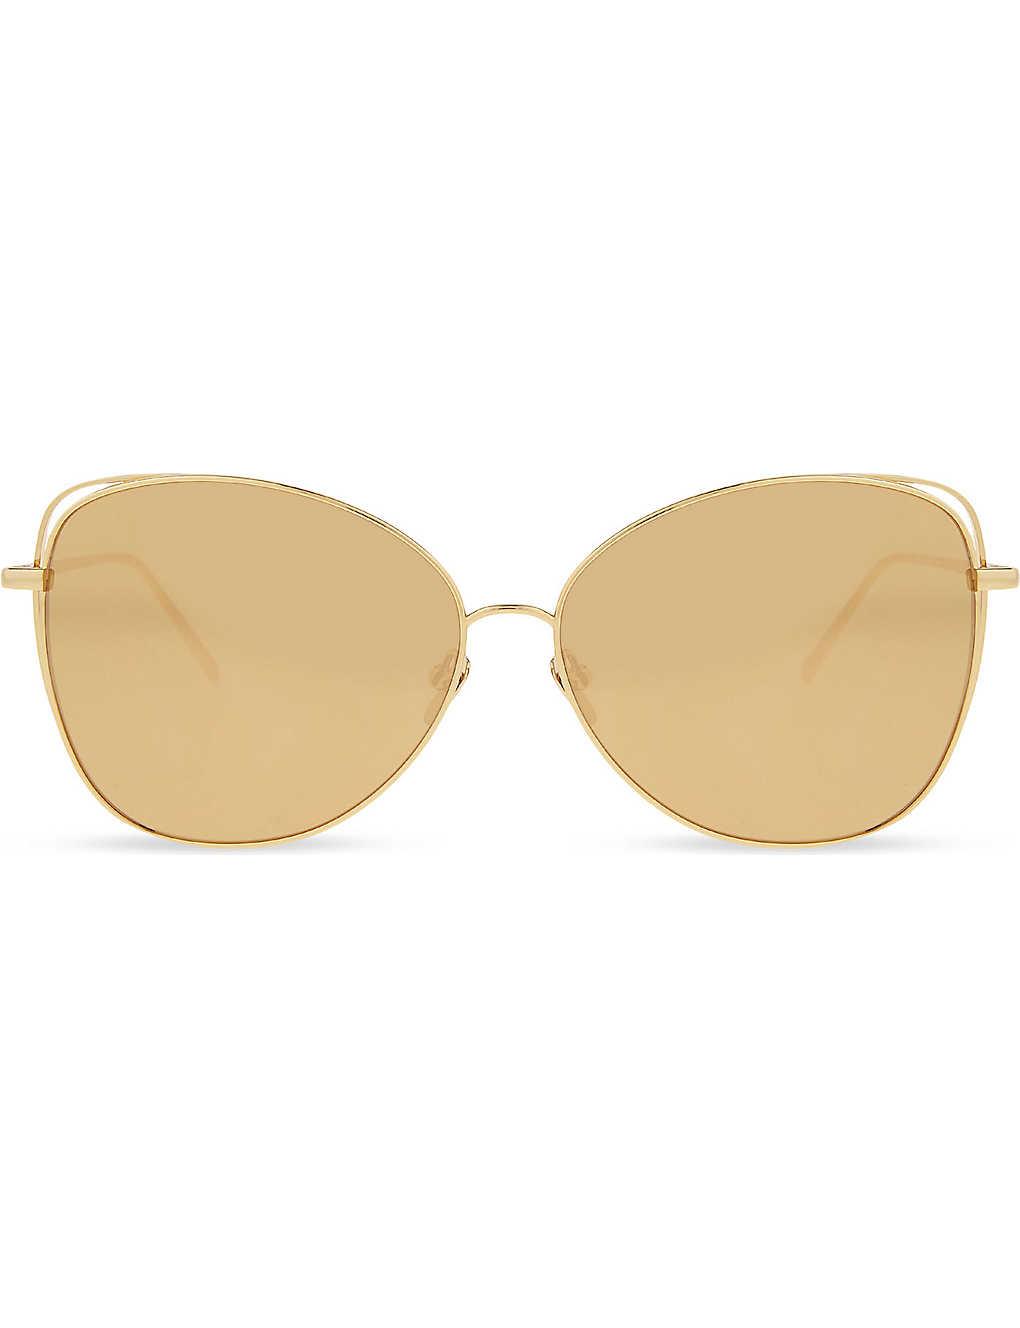 0e64bbb51a8e LINDA FARROW - Lfl566 cat-eye sunglasses